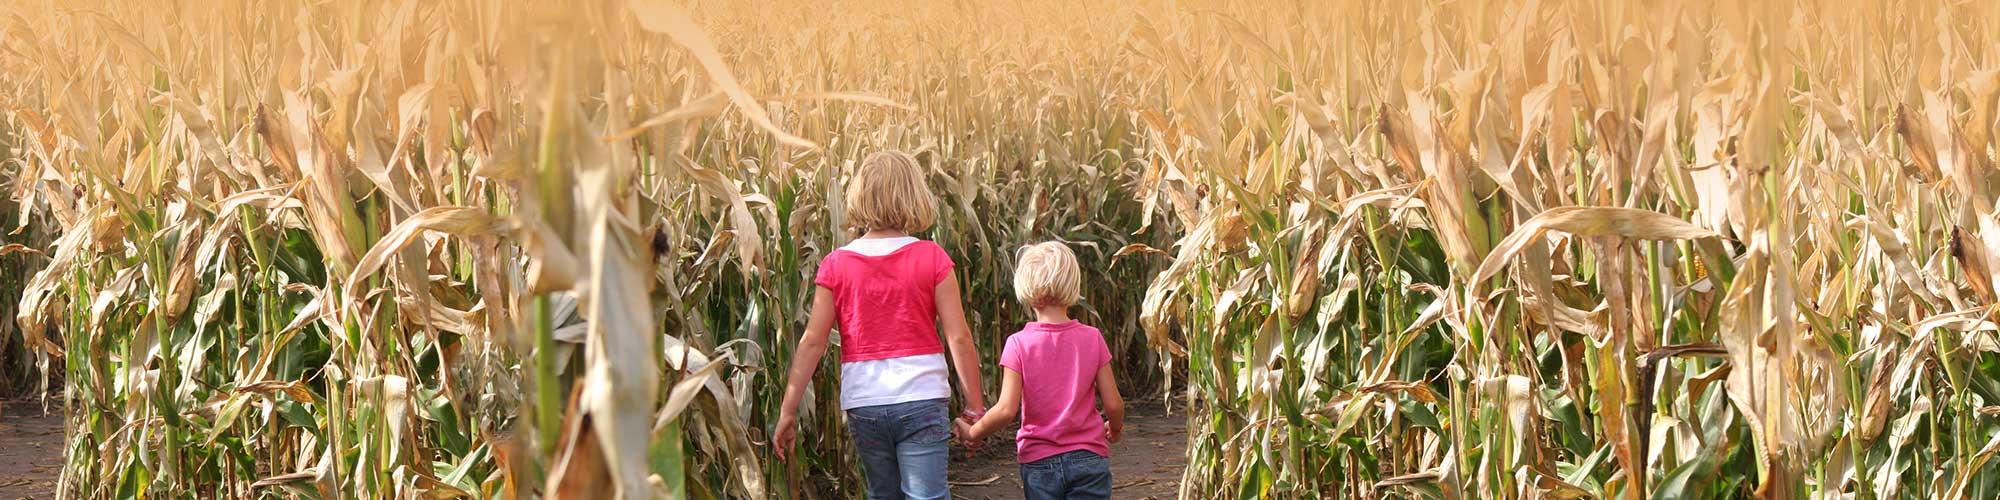 The World's Largest Corn Maze at Richardson Adventure Farm